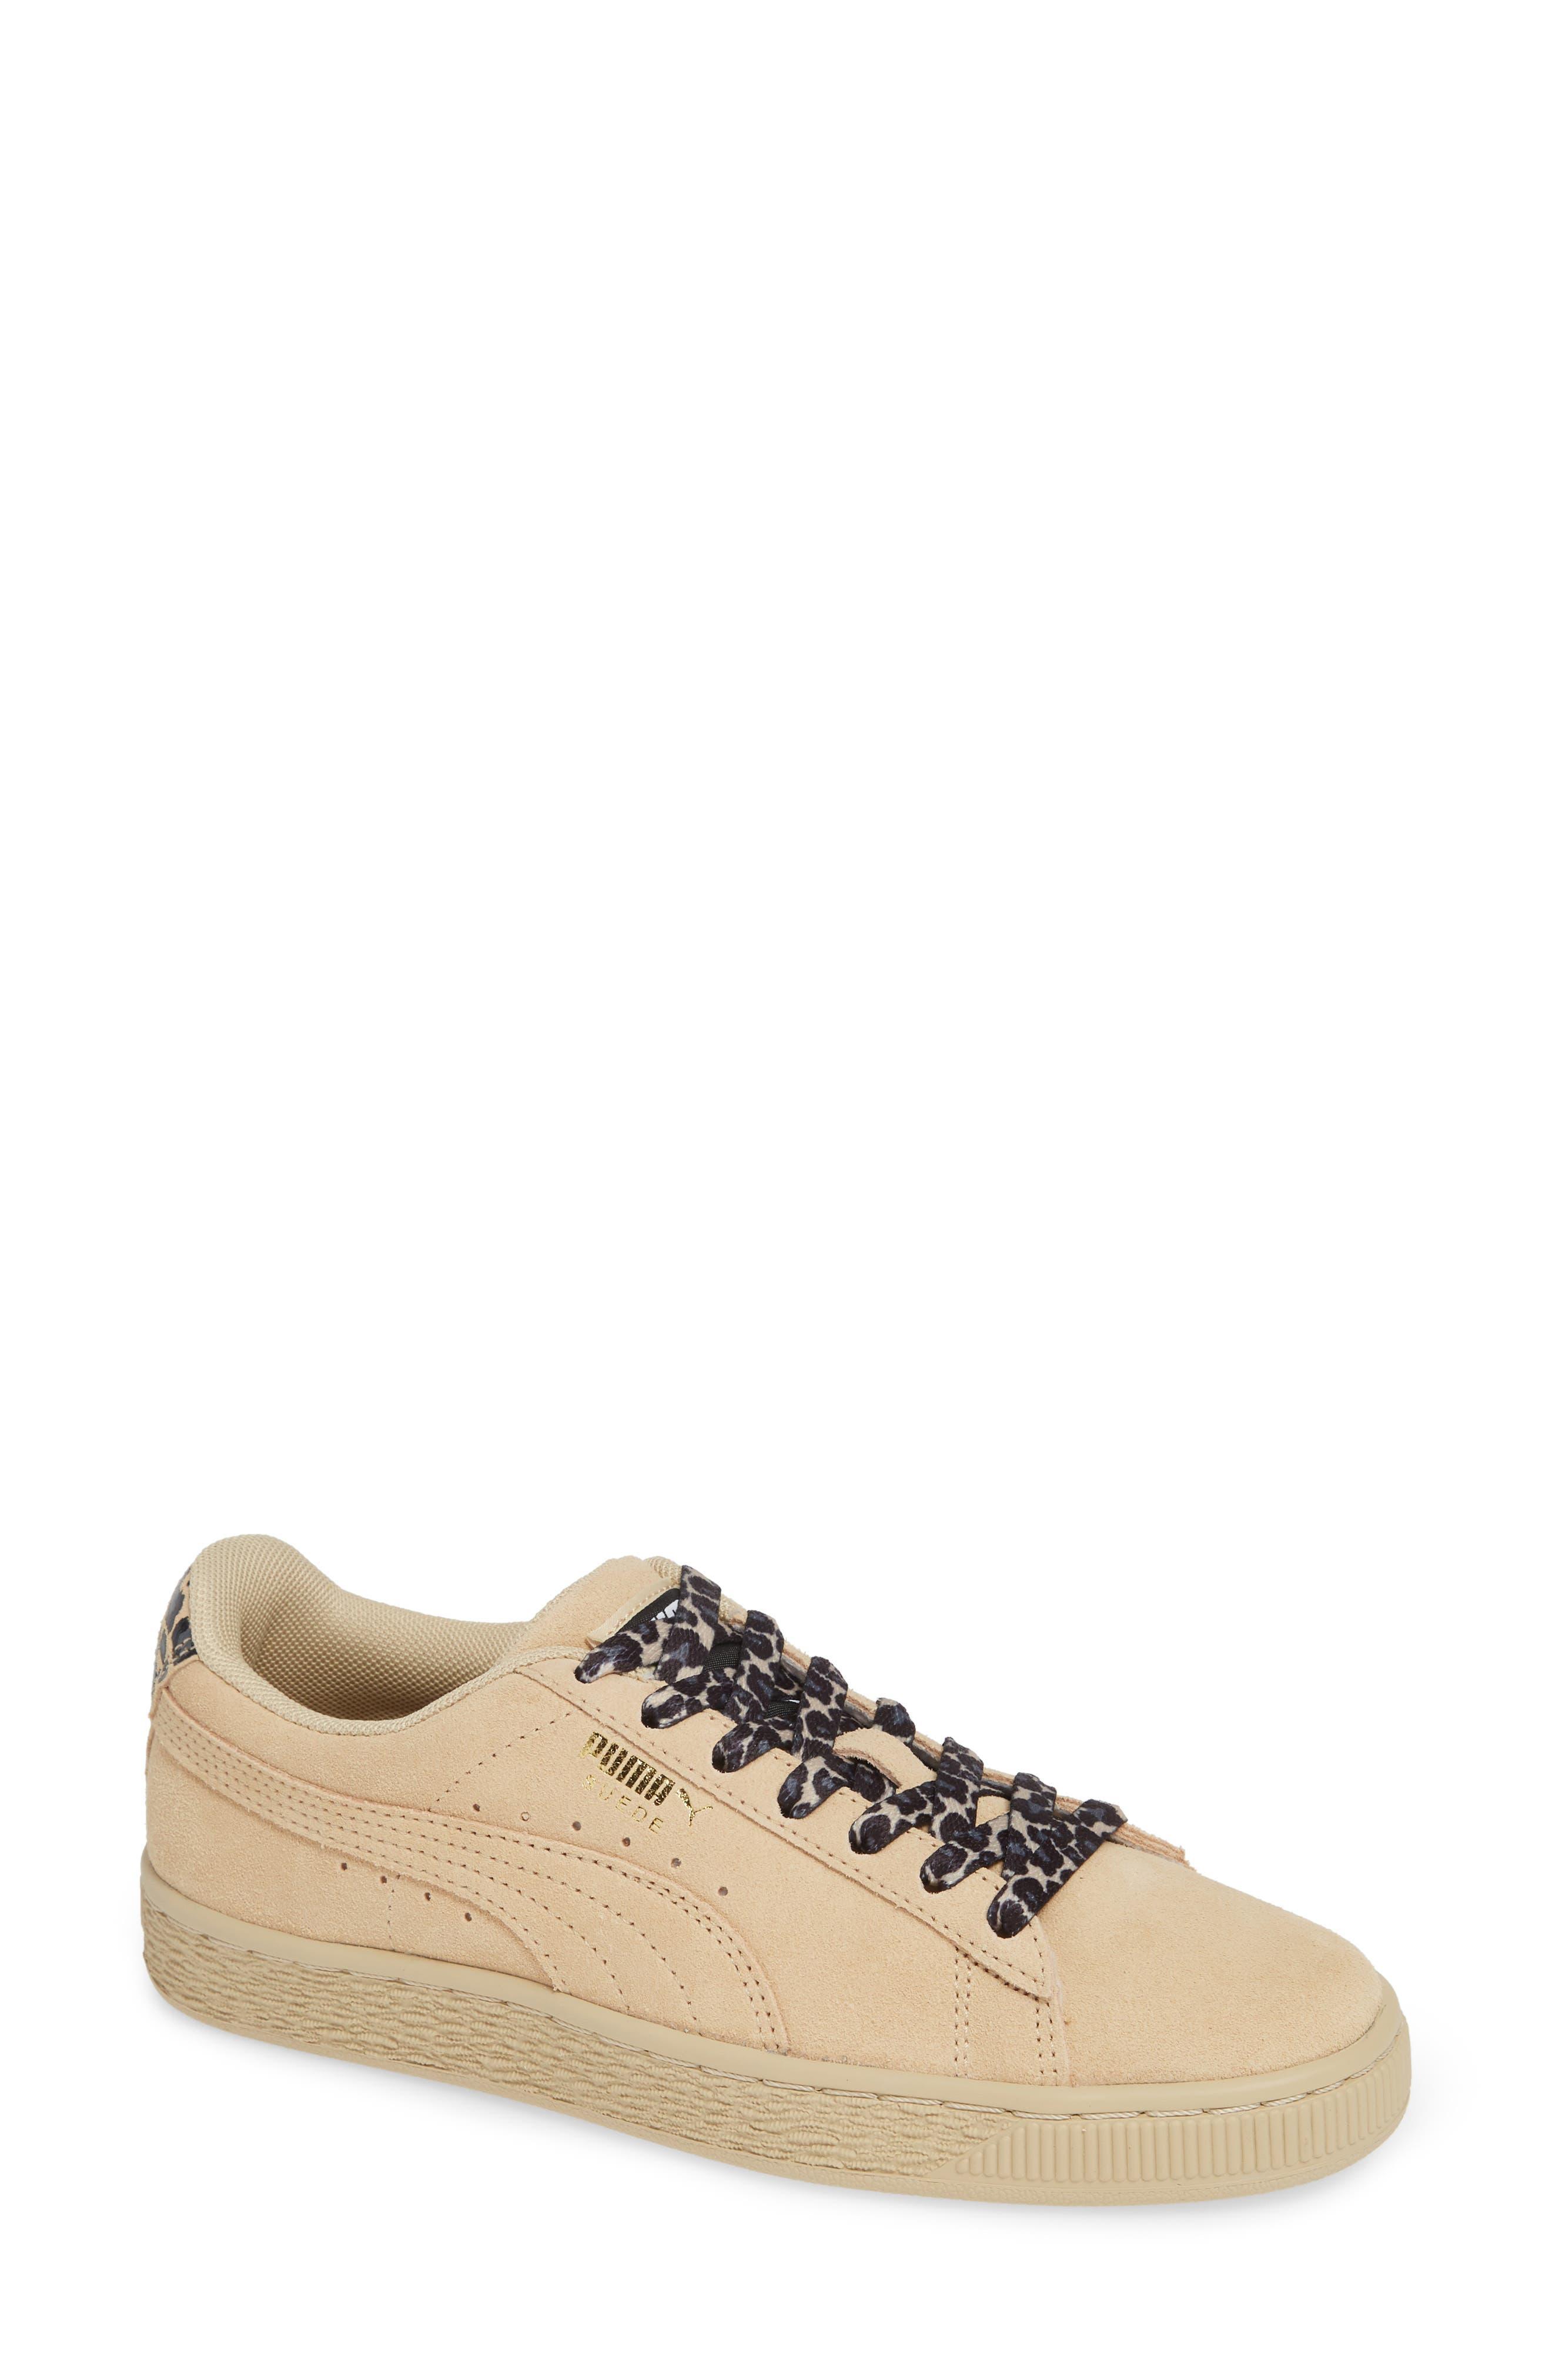 Suede Wild Sneaker, Main, color, BLACK/ TEAM GOLD/ PEBBLE